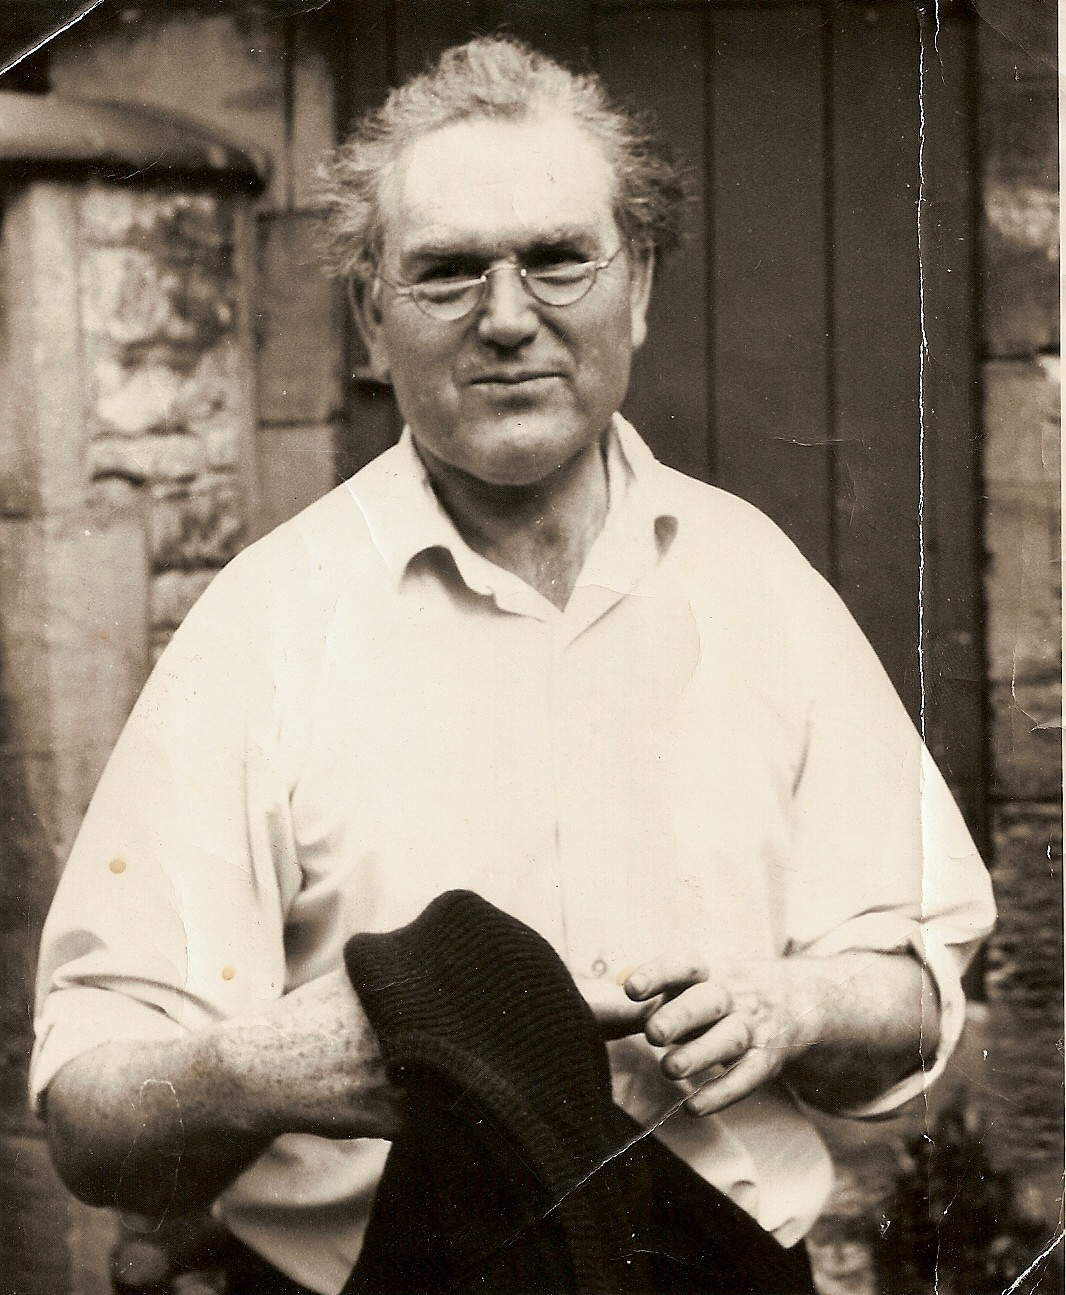 John Bridgeman